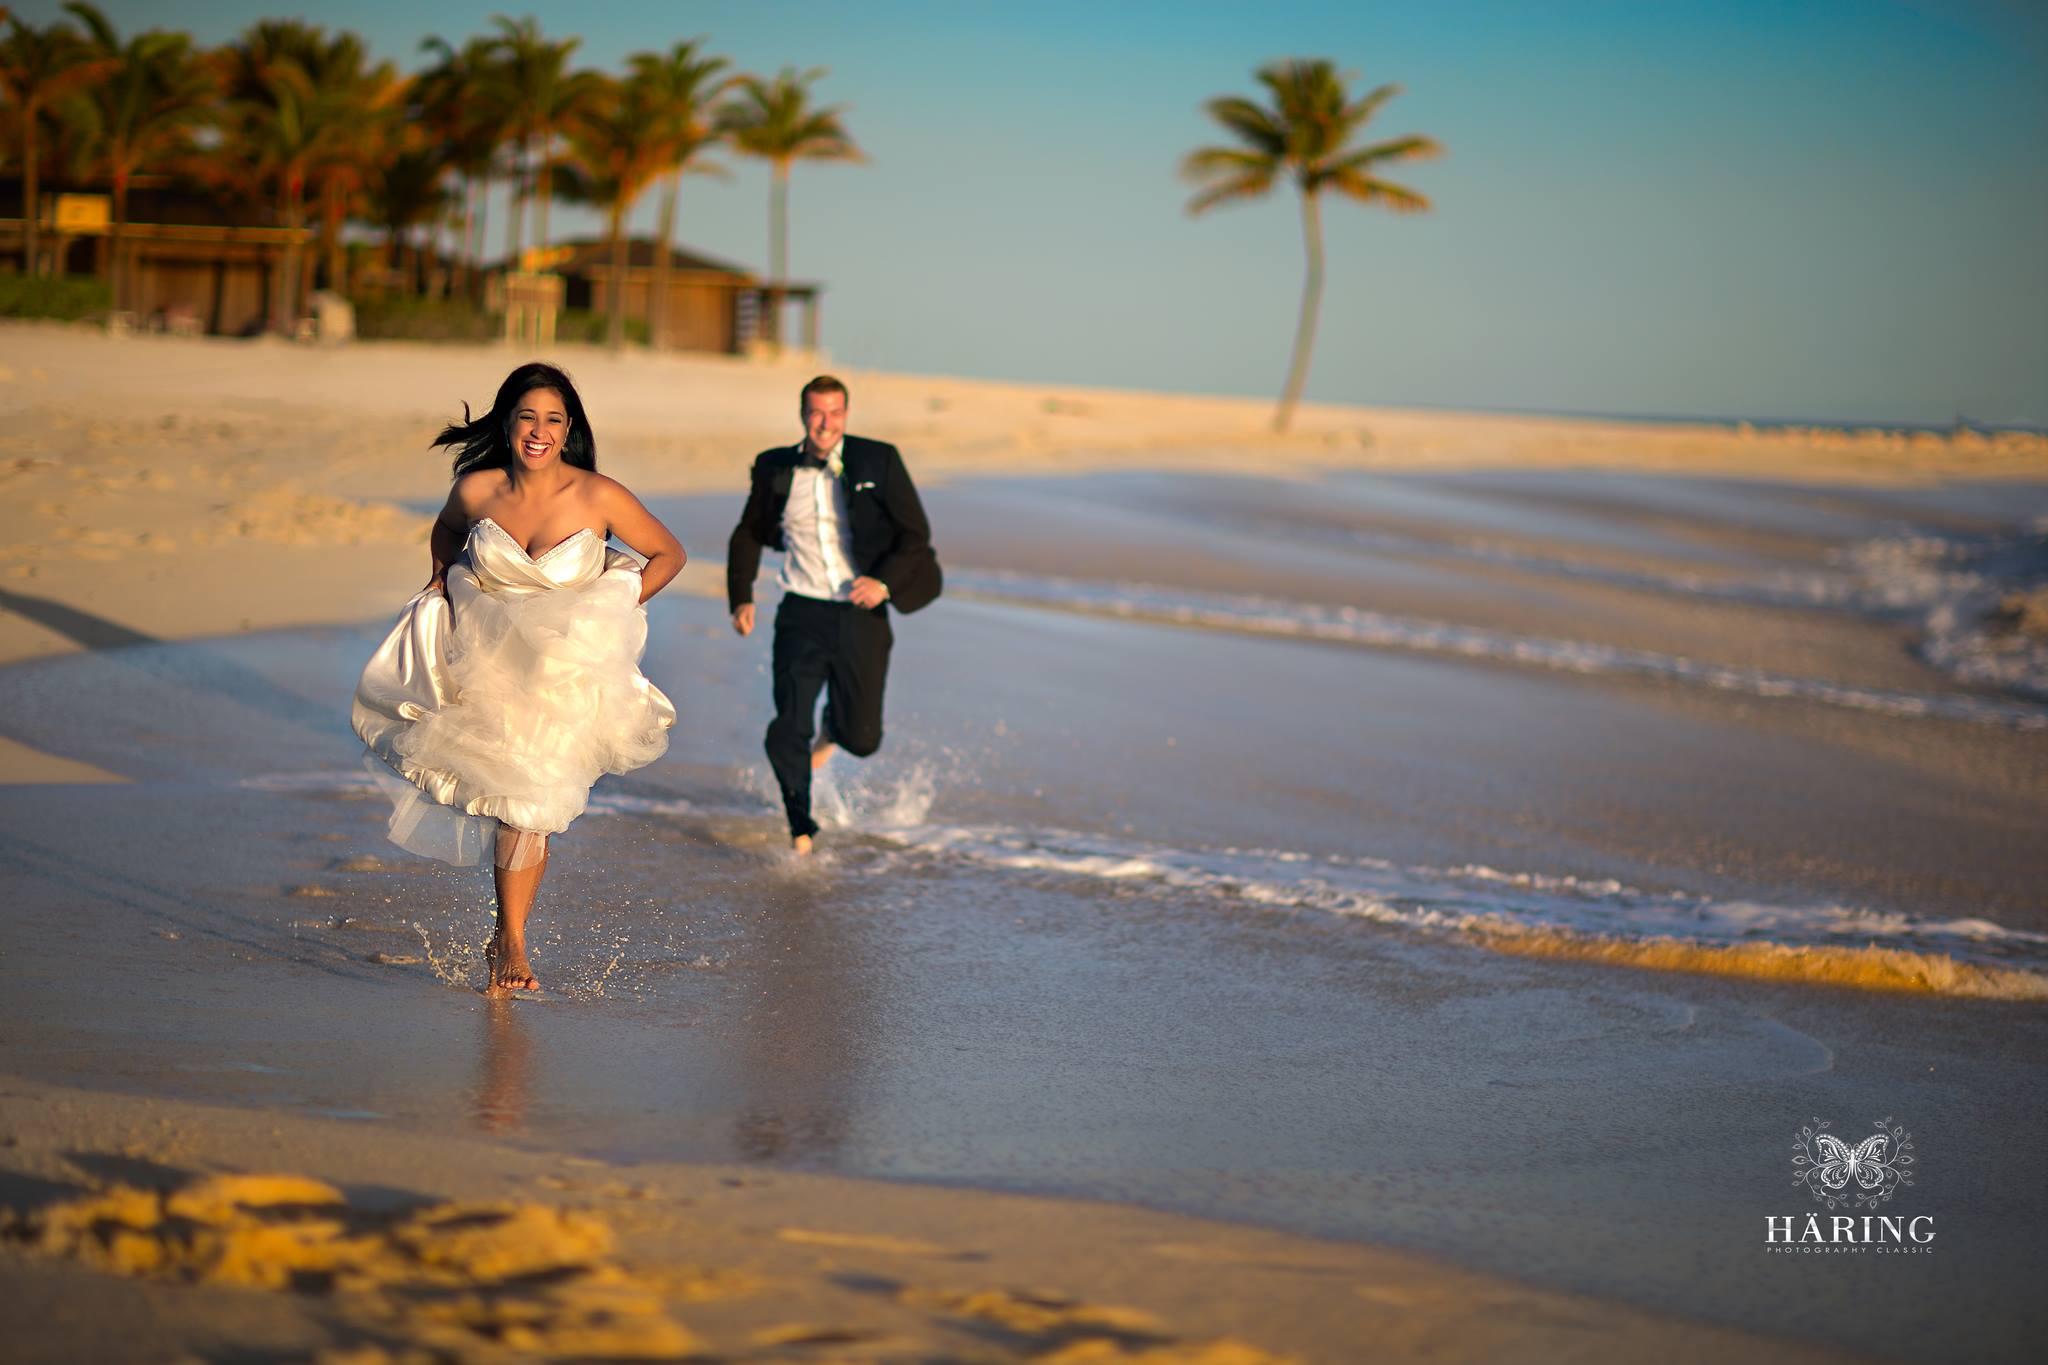 Araceli + Alex | Bahamas, Miami Wedding Photographers | Häring Photography, Indian Wedding Photographer in Florida, Best Muslim, Hindu - South East Asian Wedding Photographers